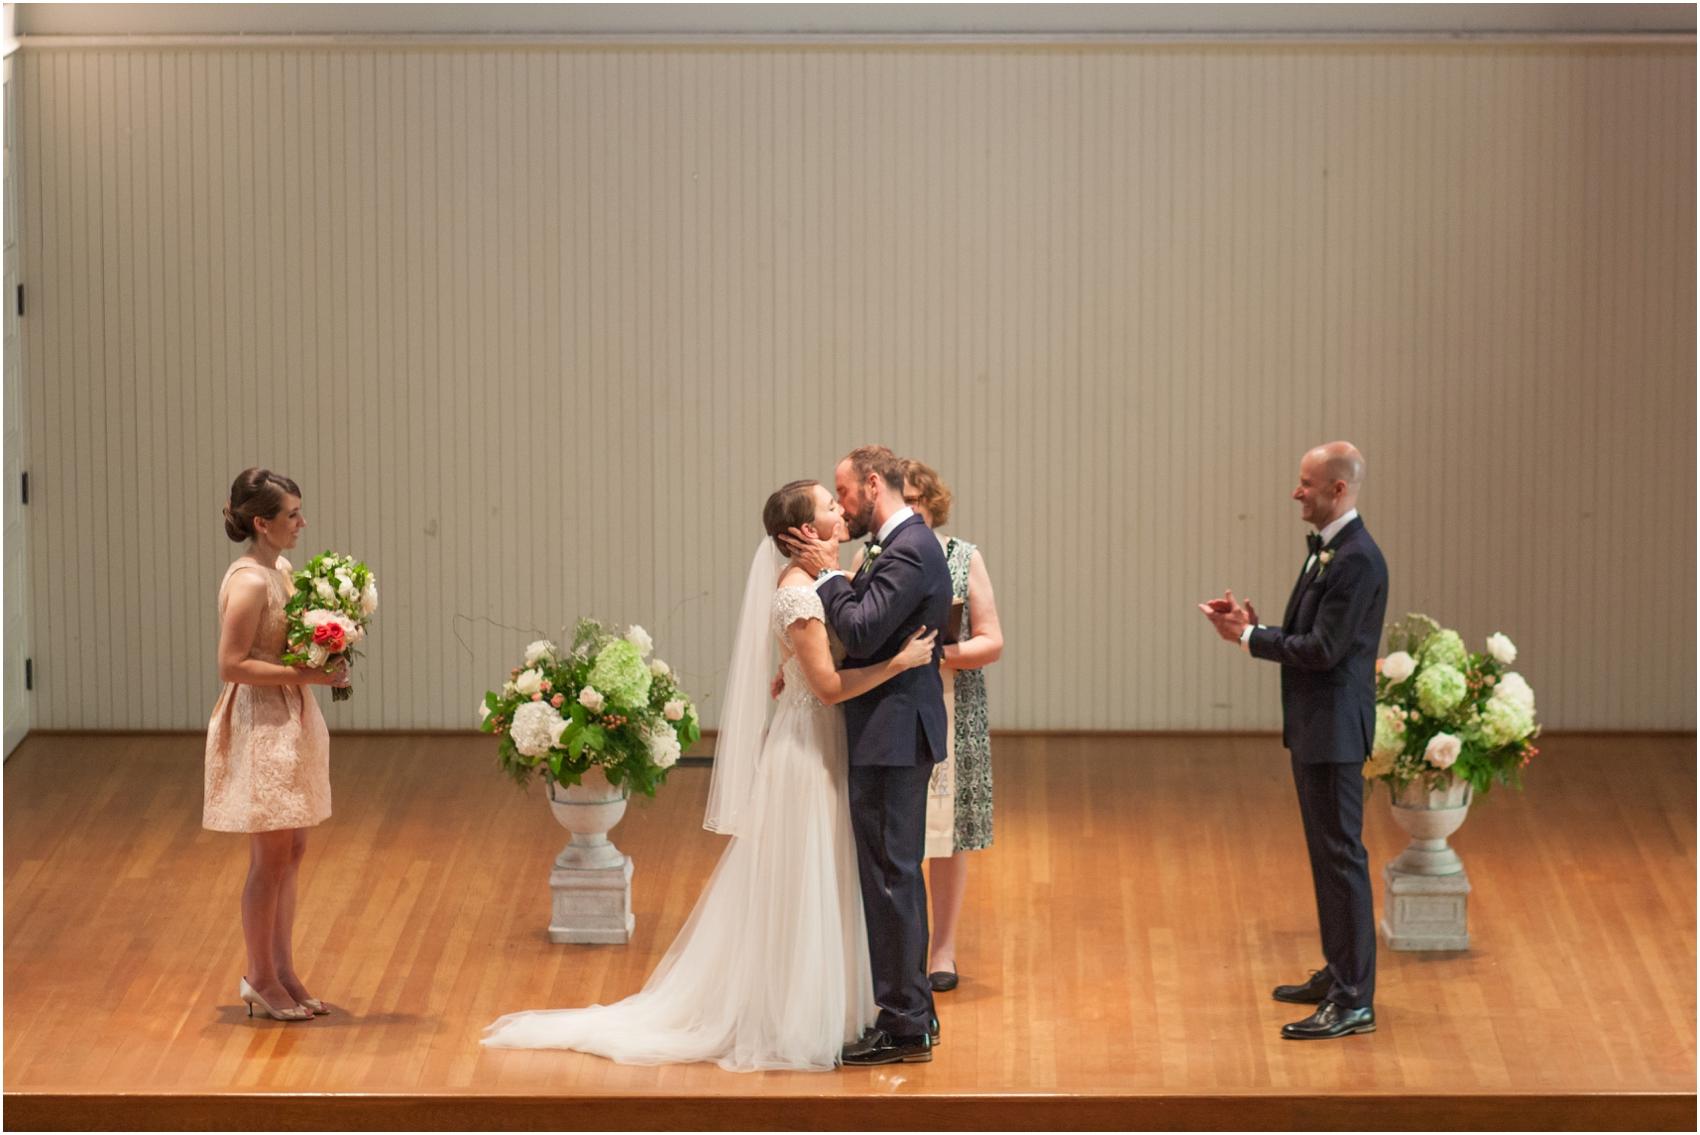 Old-Metropolitan-Hall-Wedding-Charlottesville-Virginia-434.jpg